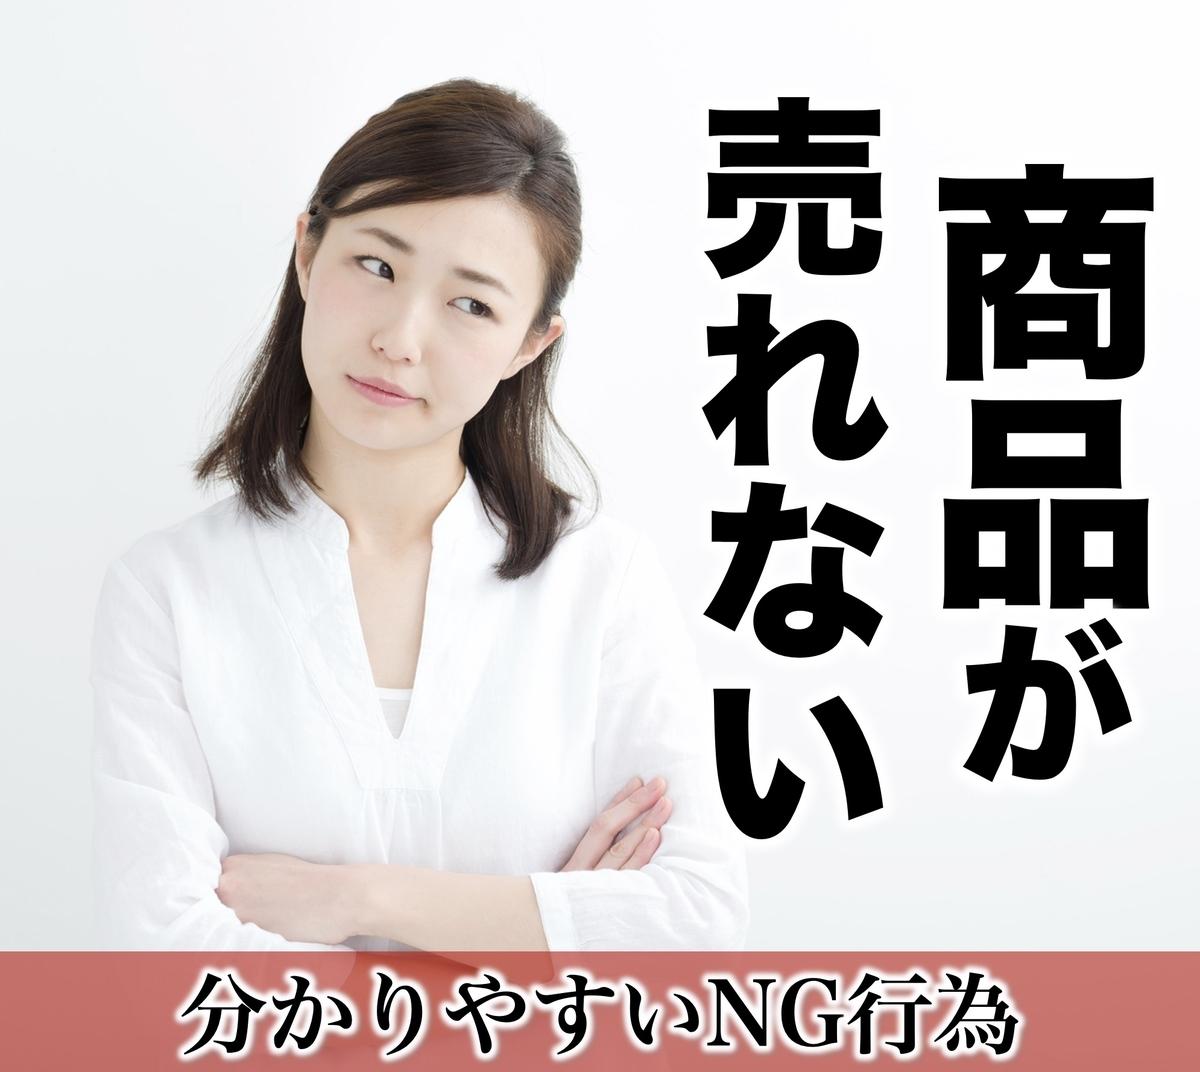 f:id:presen-sen-nin:20200707232541j:plain